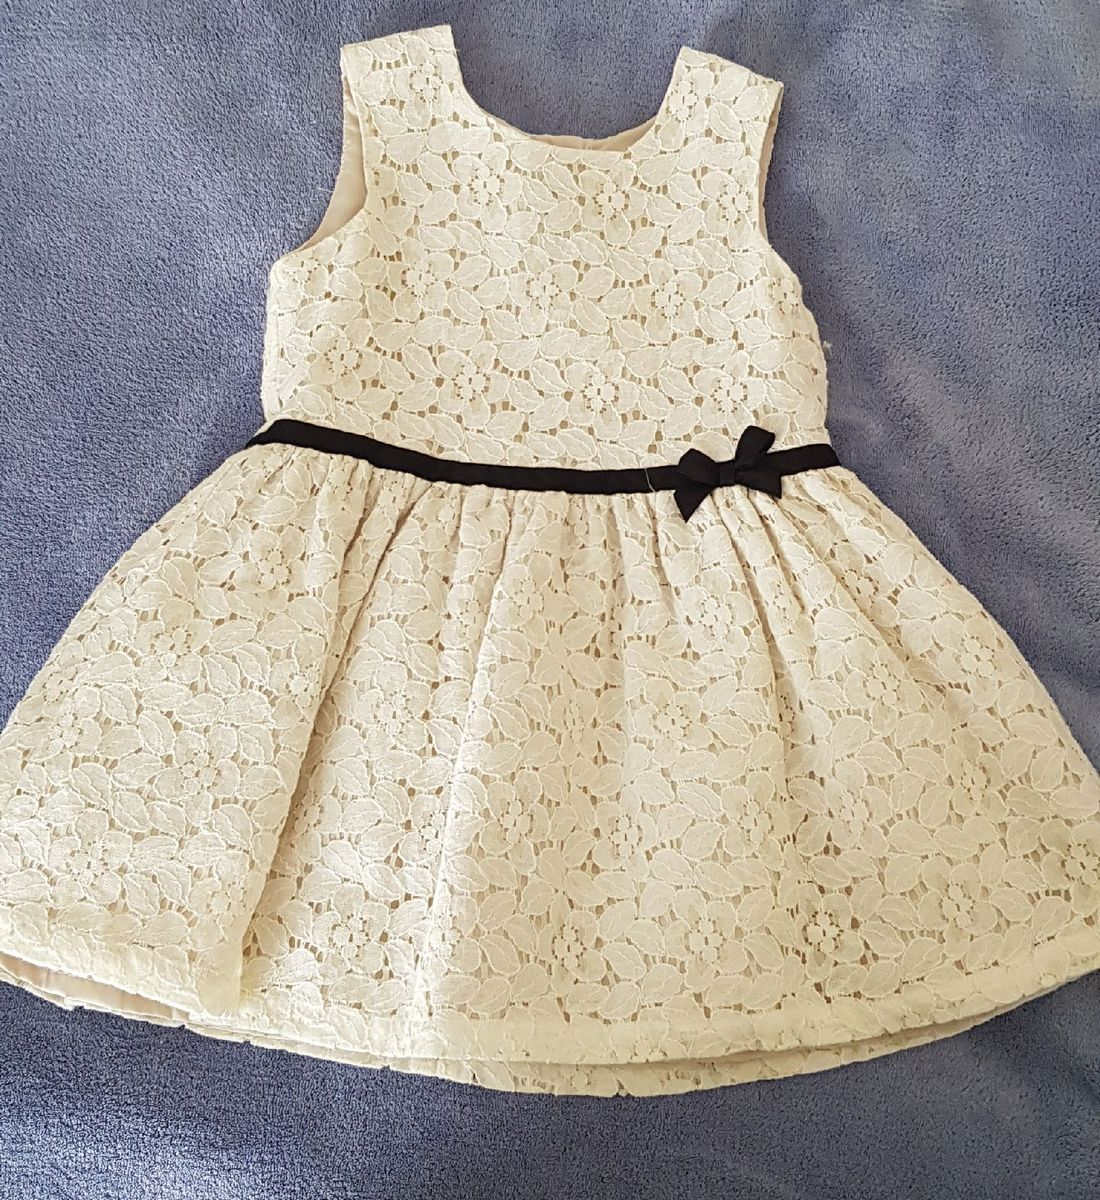 1baa795768 vestido de renda carter s - menina carter s.  Czm6ly9wag90b3muzw5qb2vplmnvbs5ici9wcm9kdwn0cy83mdc3mjivmdblzgyzndu1ztg4otizyznmmdfjy2q2ntfknja2ntyuanbn